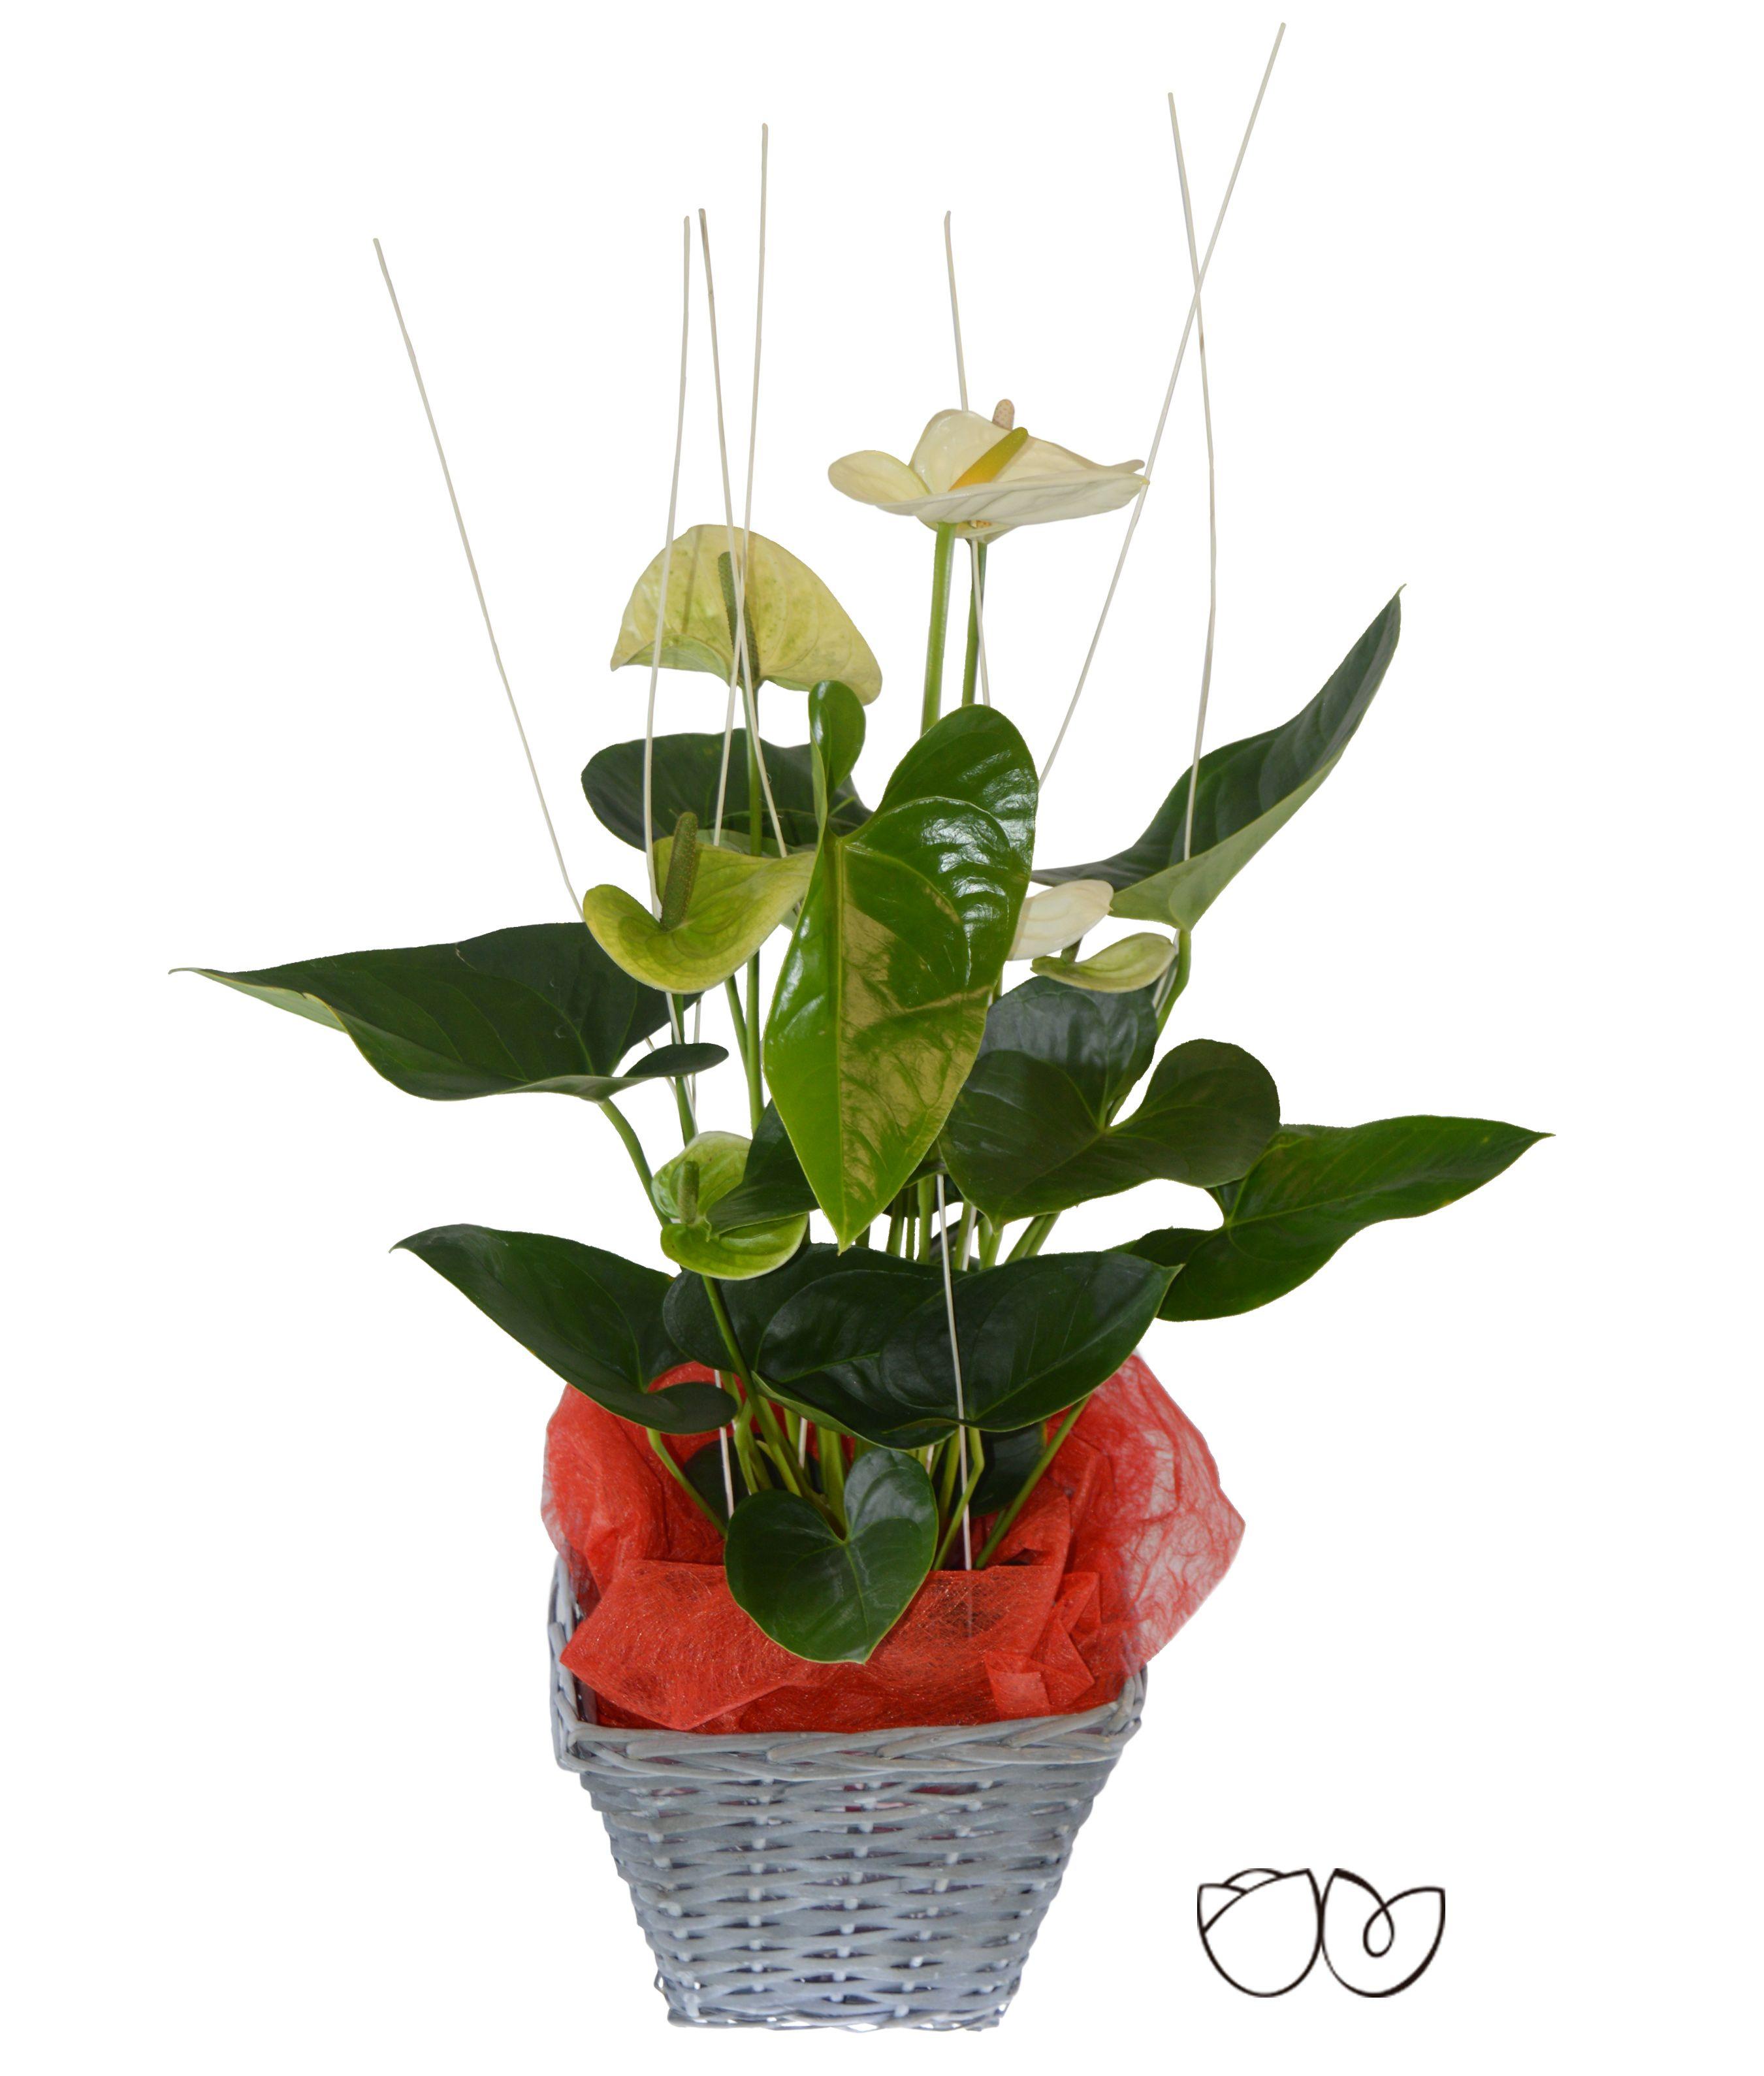 Planta anthurium con esta bonita planta decorativa de interior de anthurium llamativa por - Plantas decorativas interior ...